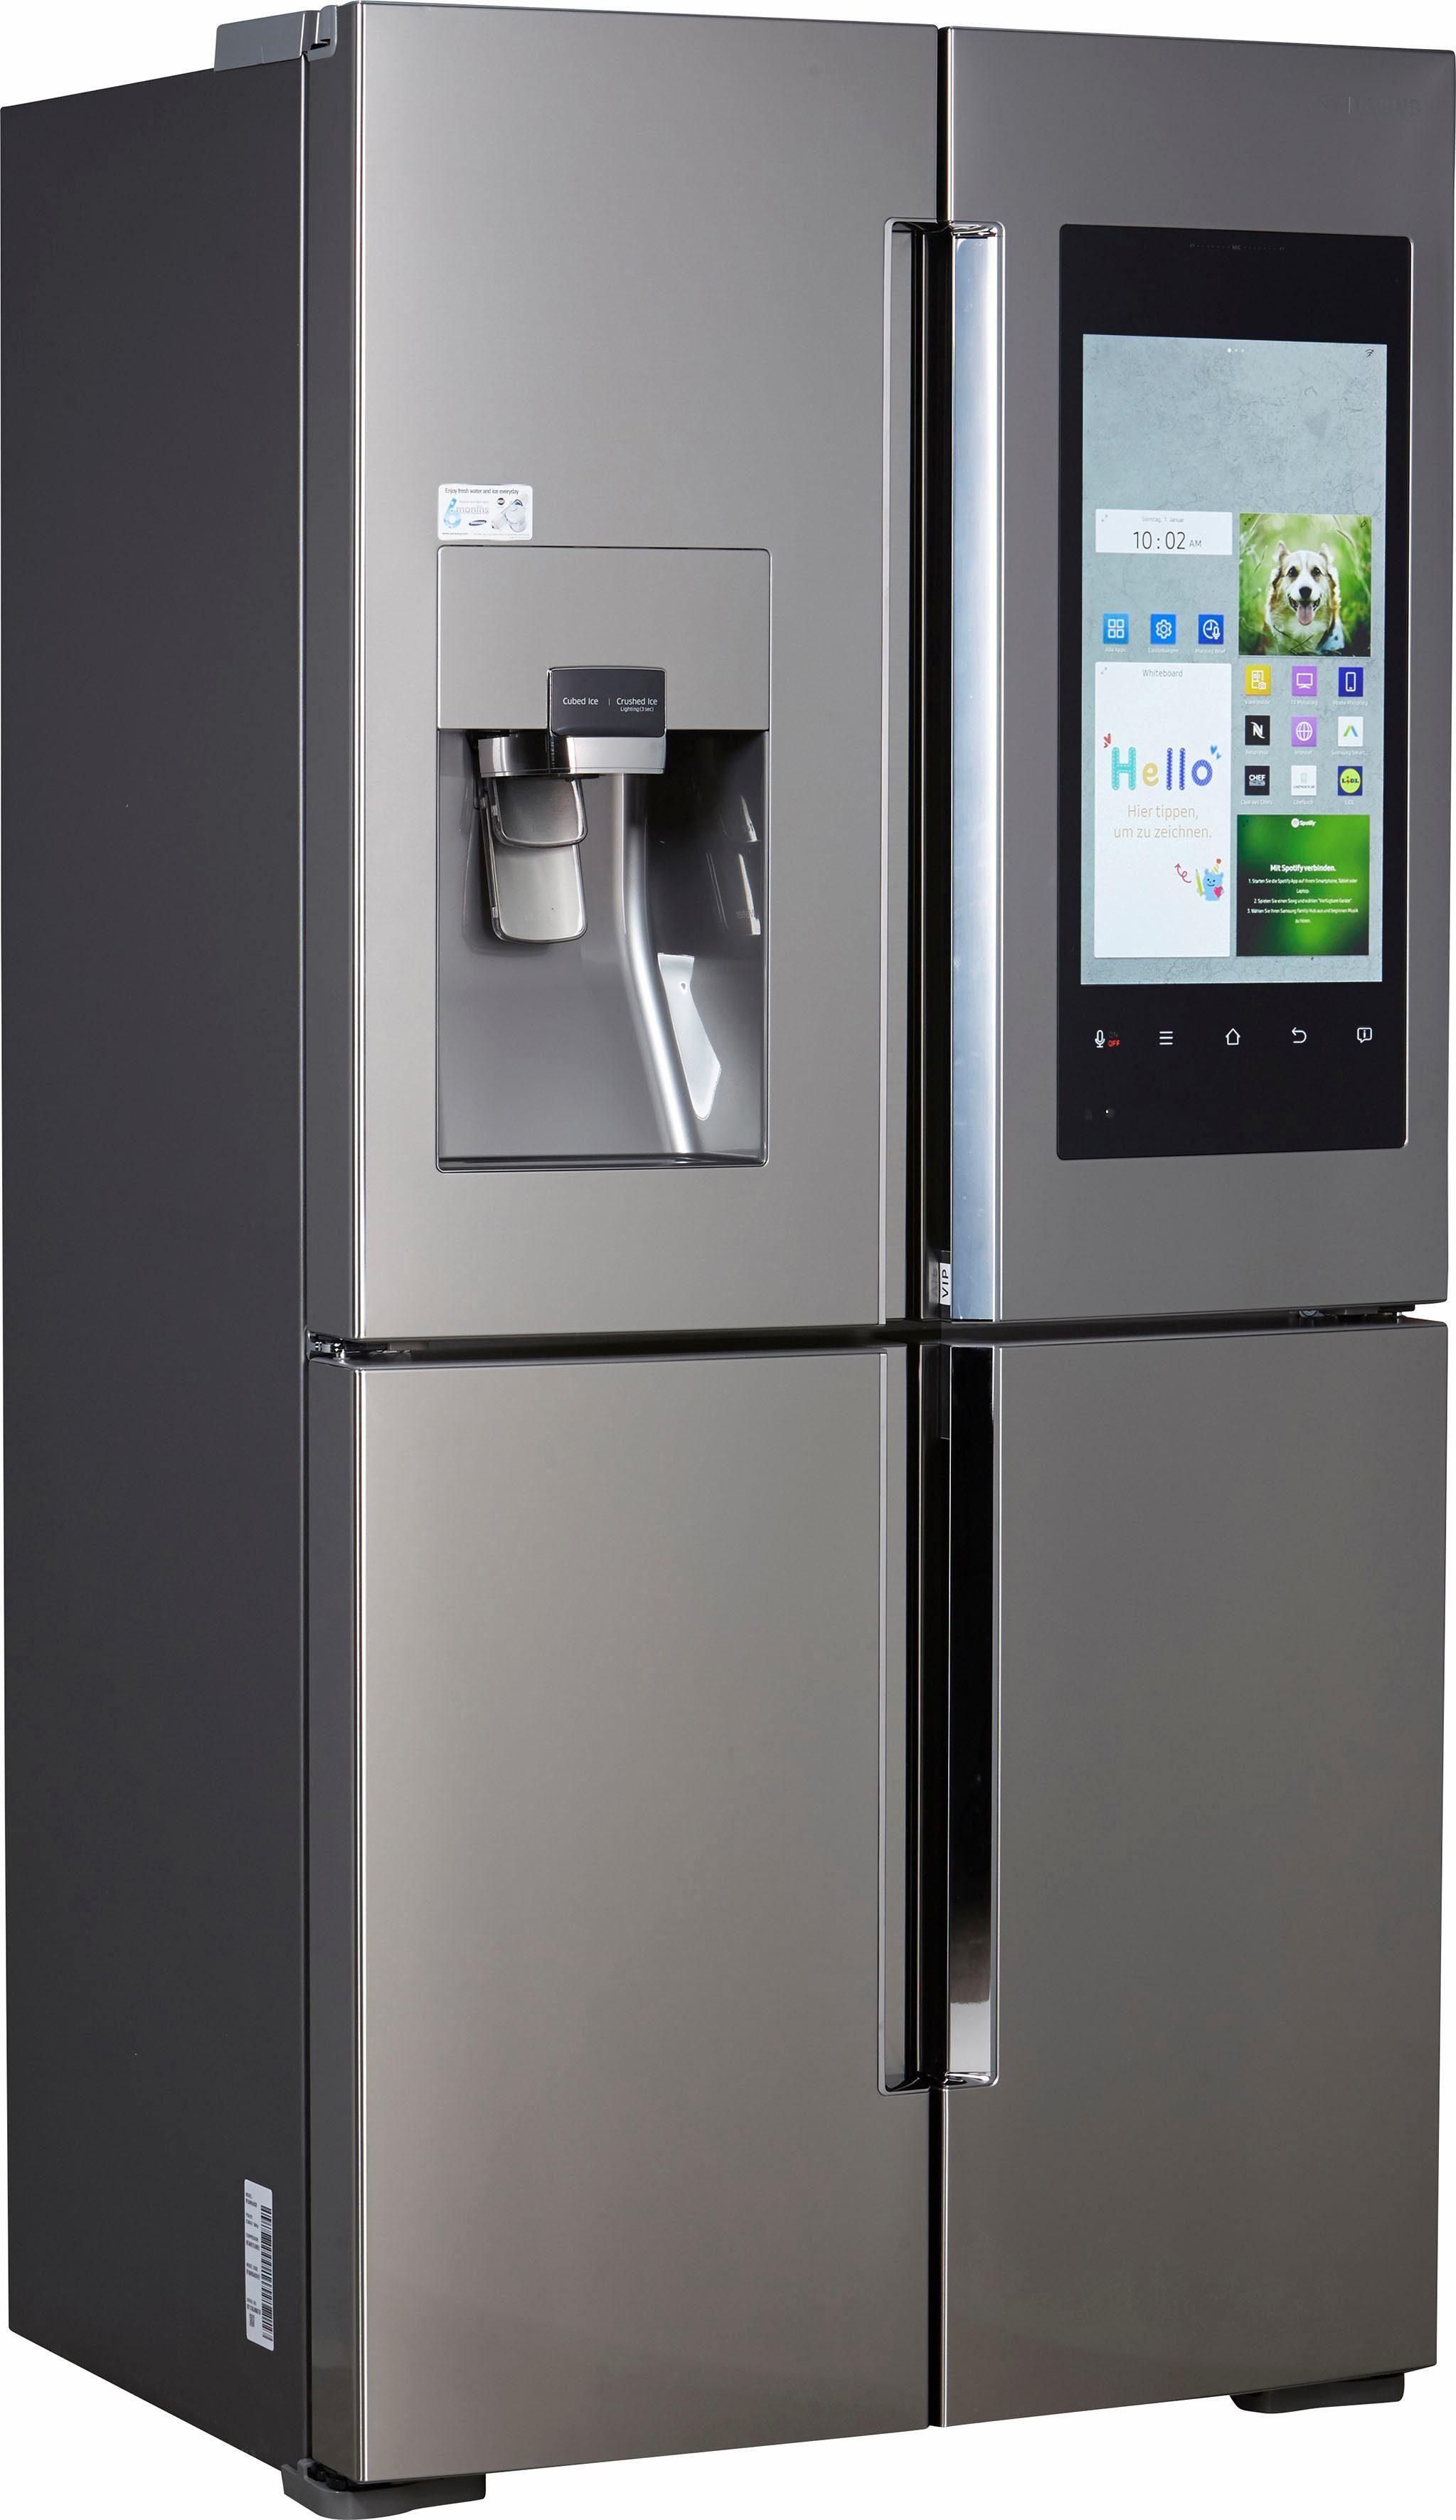 Samsung French Door Kühlschrank RF56M9540, 182,5 cm hoch, 90,8 cm breit, Family Hub – Display im Kühlschrank